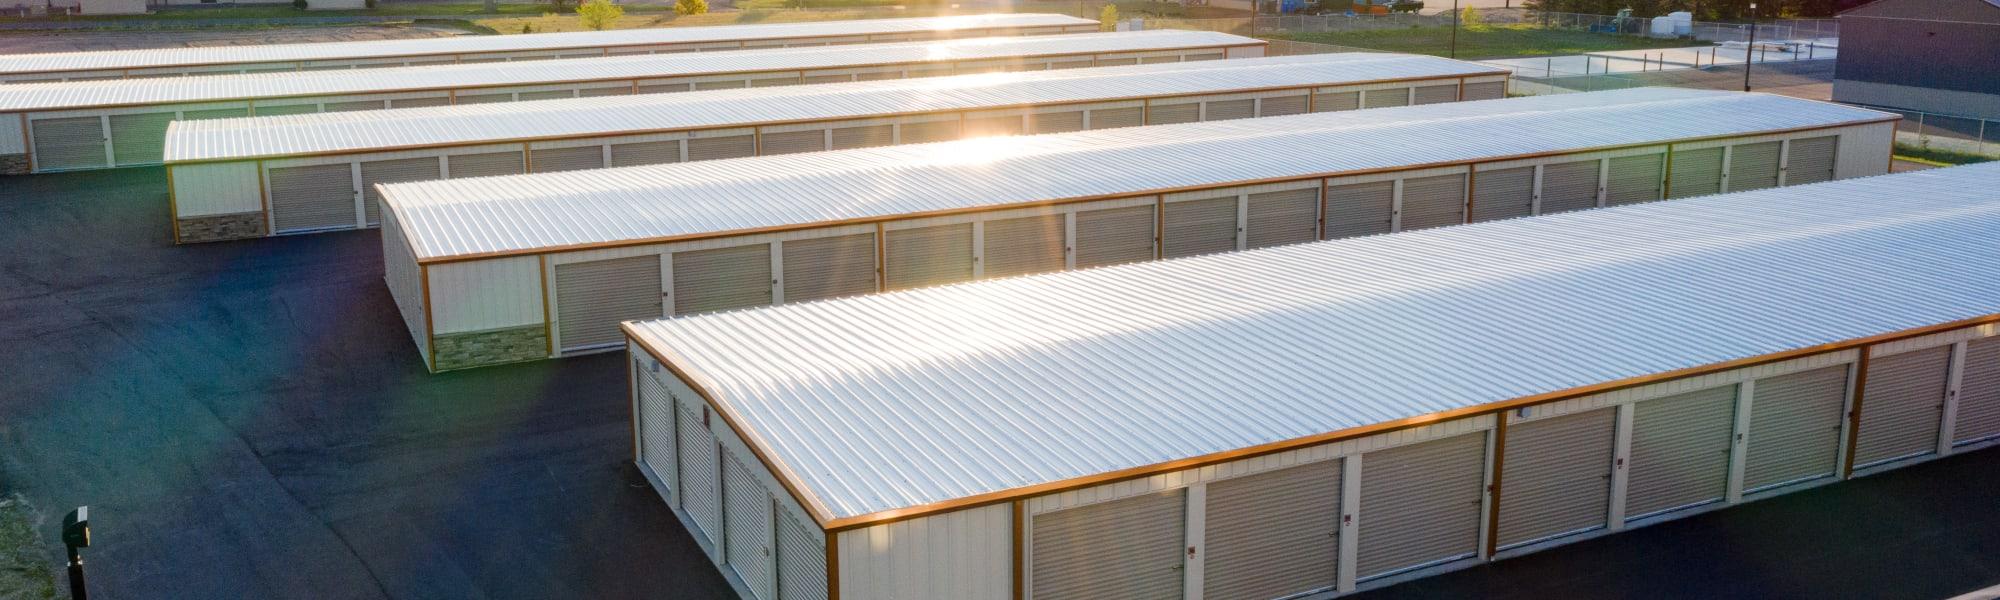 Aerial view of outdoor units at KO Storage in Minnetonka, Minnesota